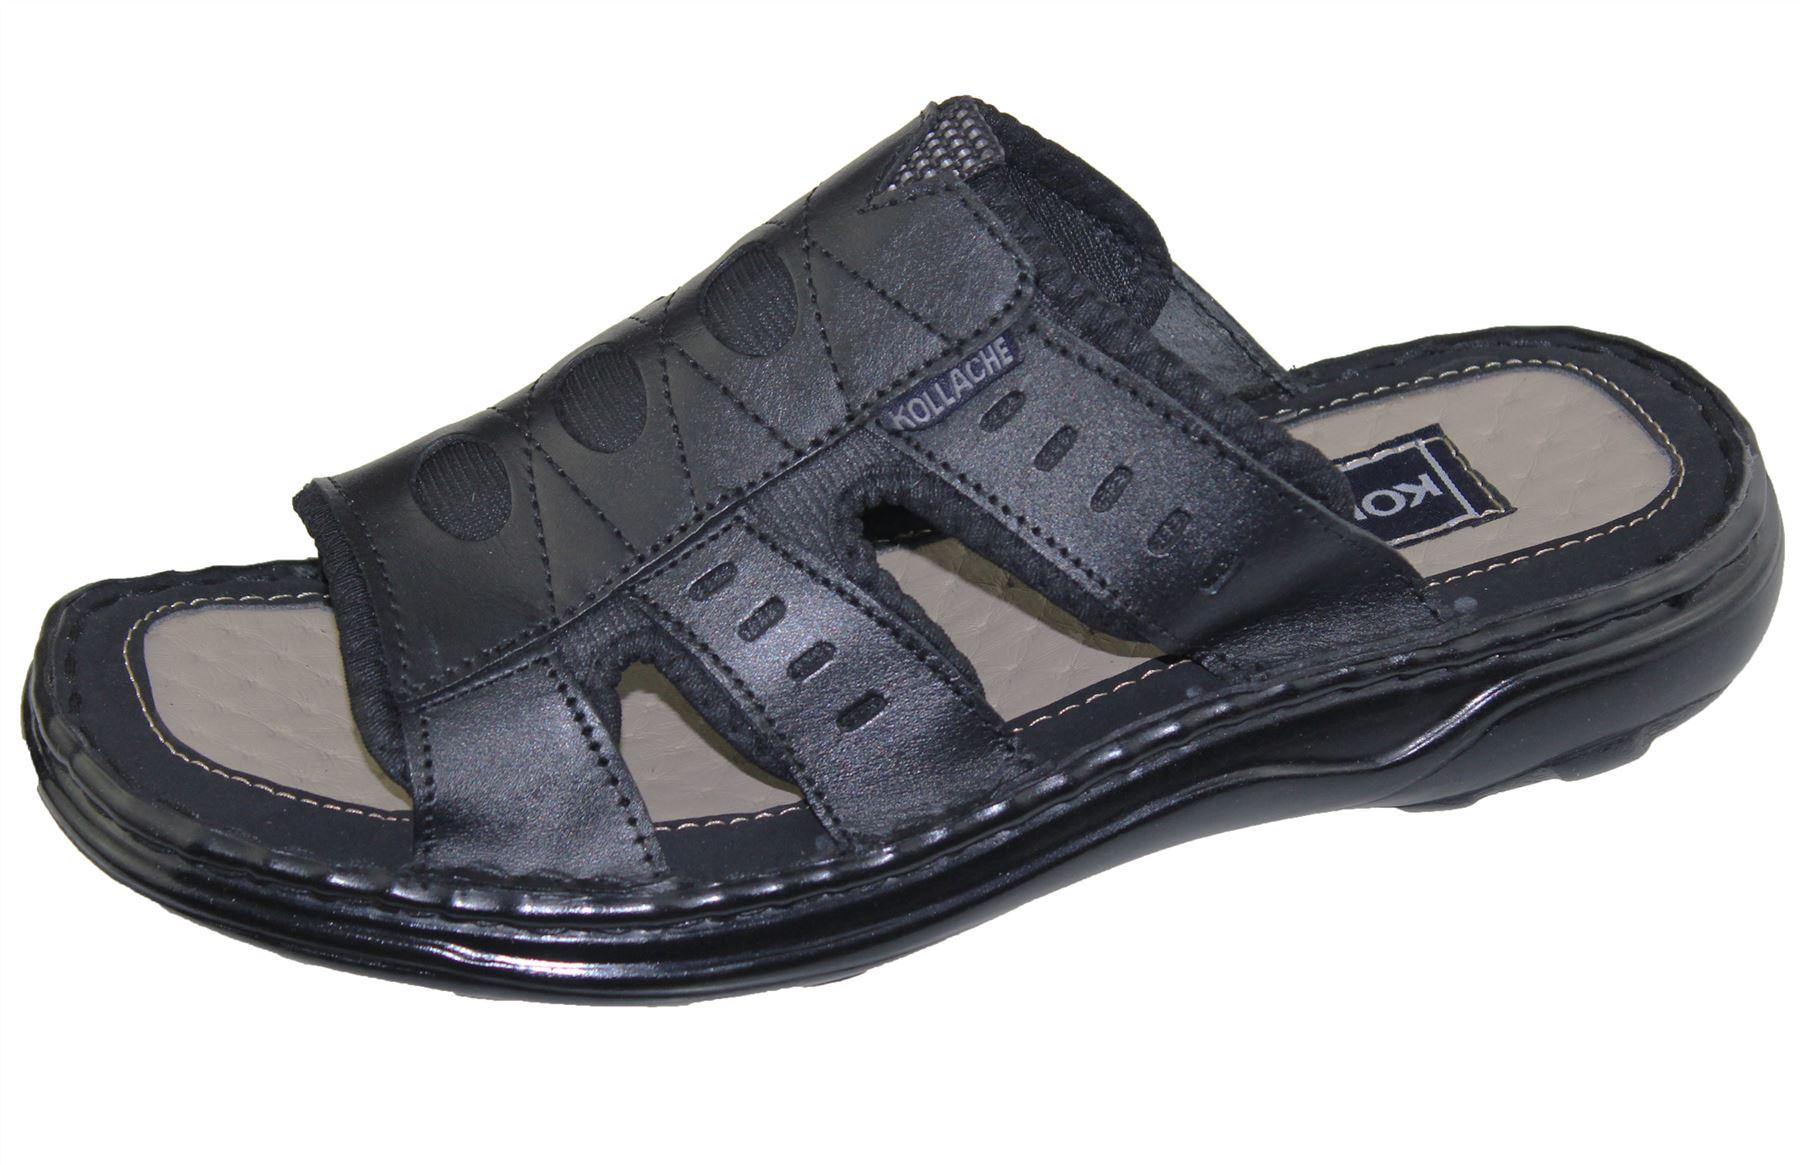 Mens-Slipper-Sandal-Sports-Beach-Buckle-Walking-Fashion-Summer-Casual-Shoes-Size miniatura 11